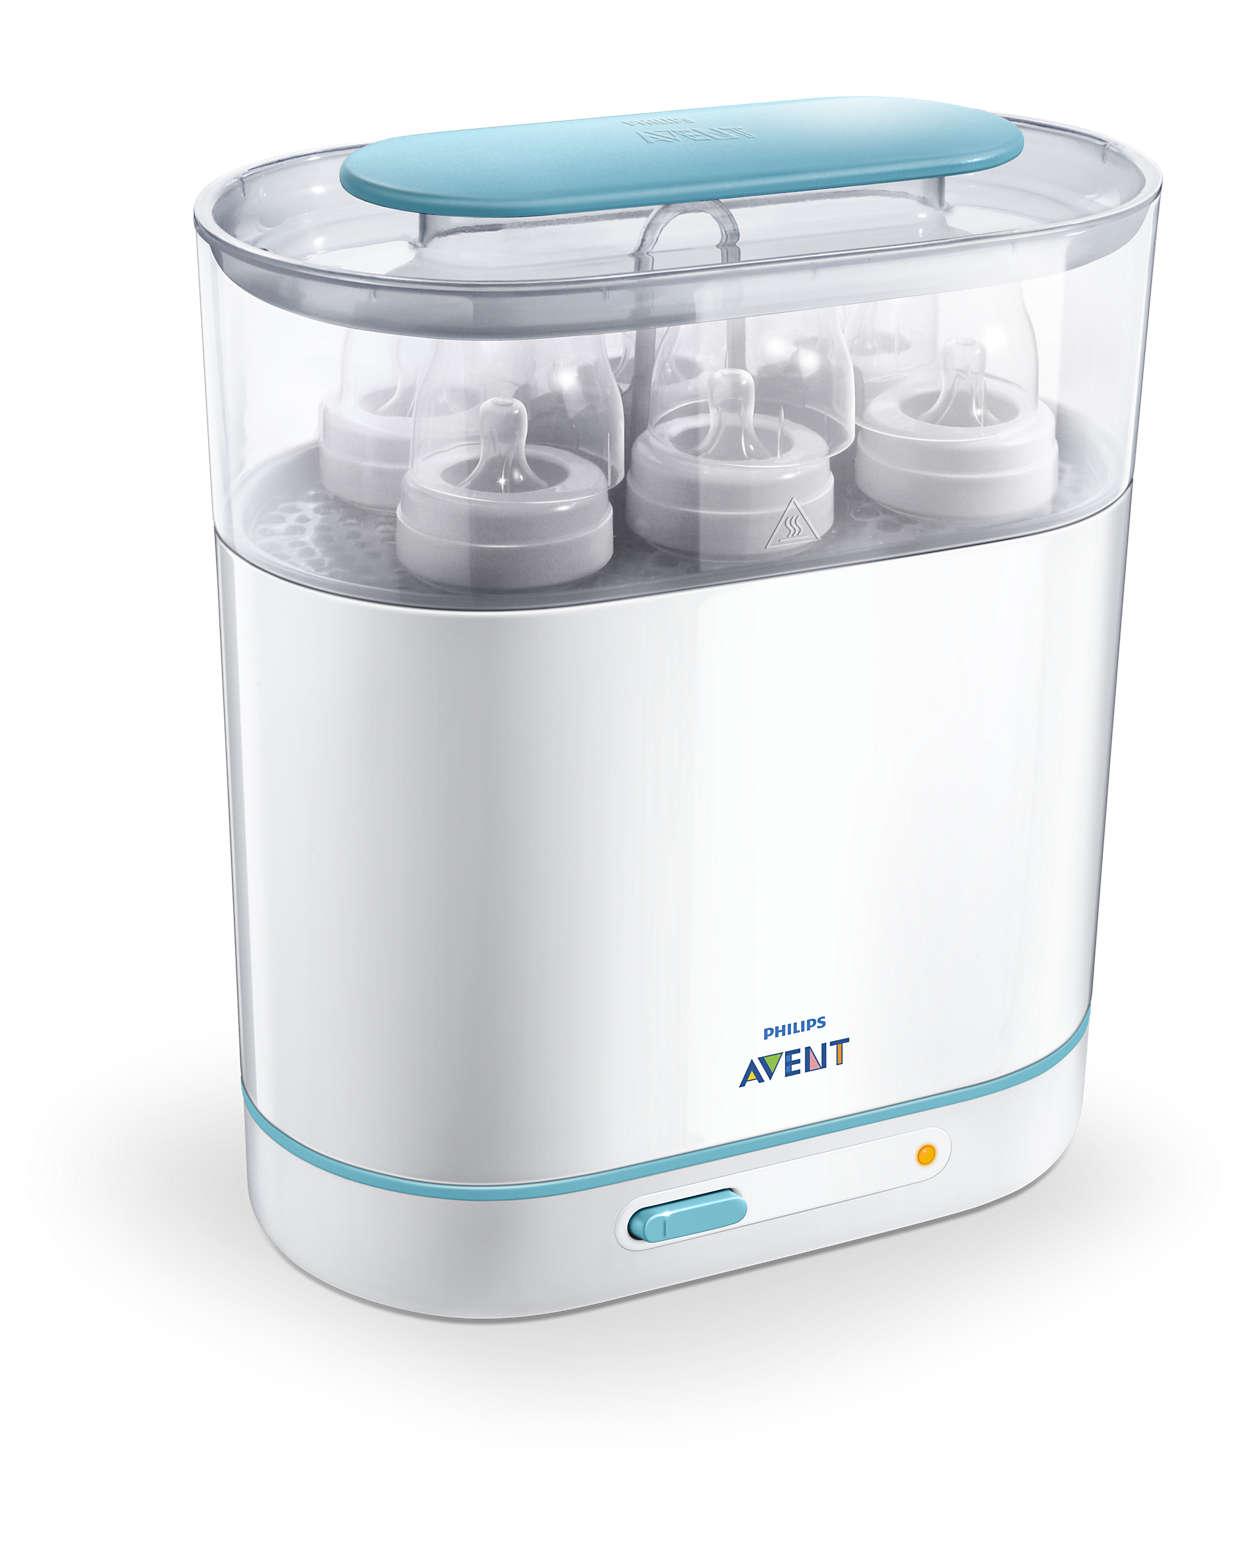 Philips avent 3-in-1 electric steam sterilizer.